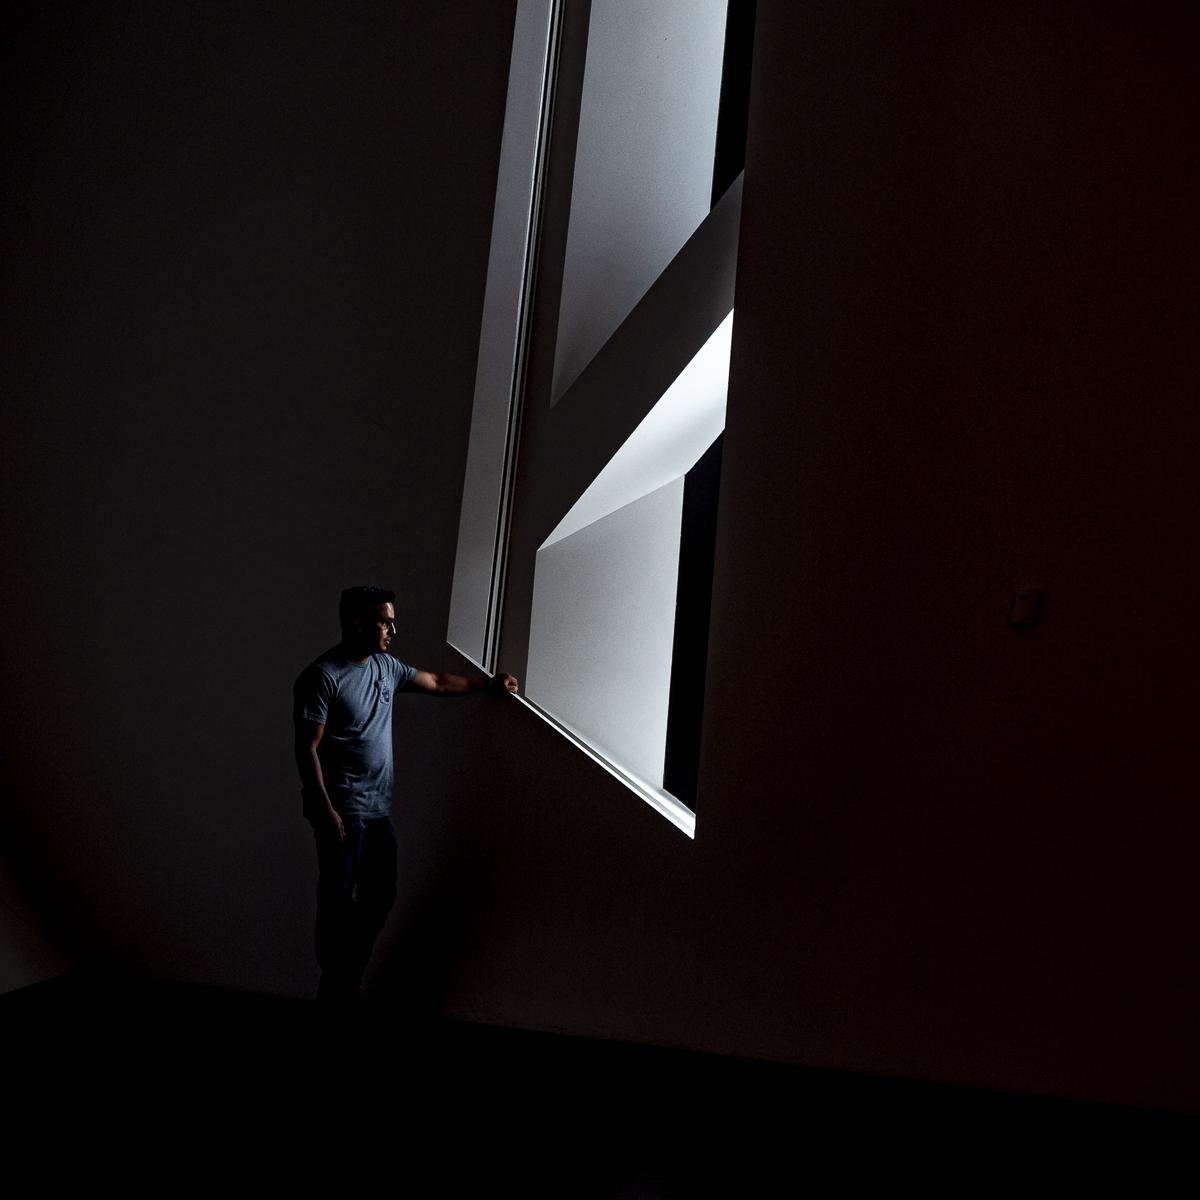 Posing Denver Art Museum